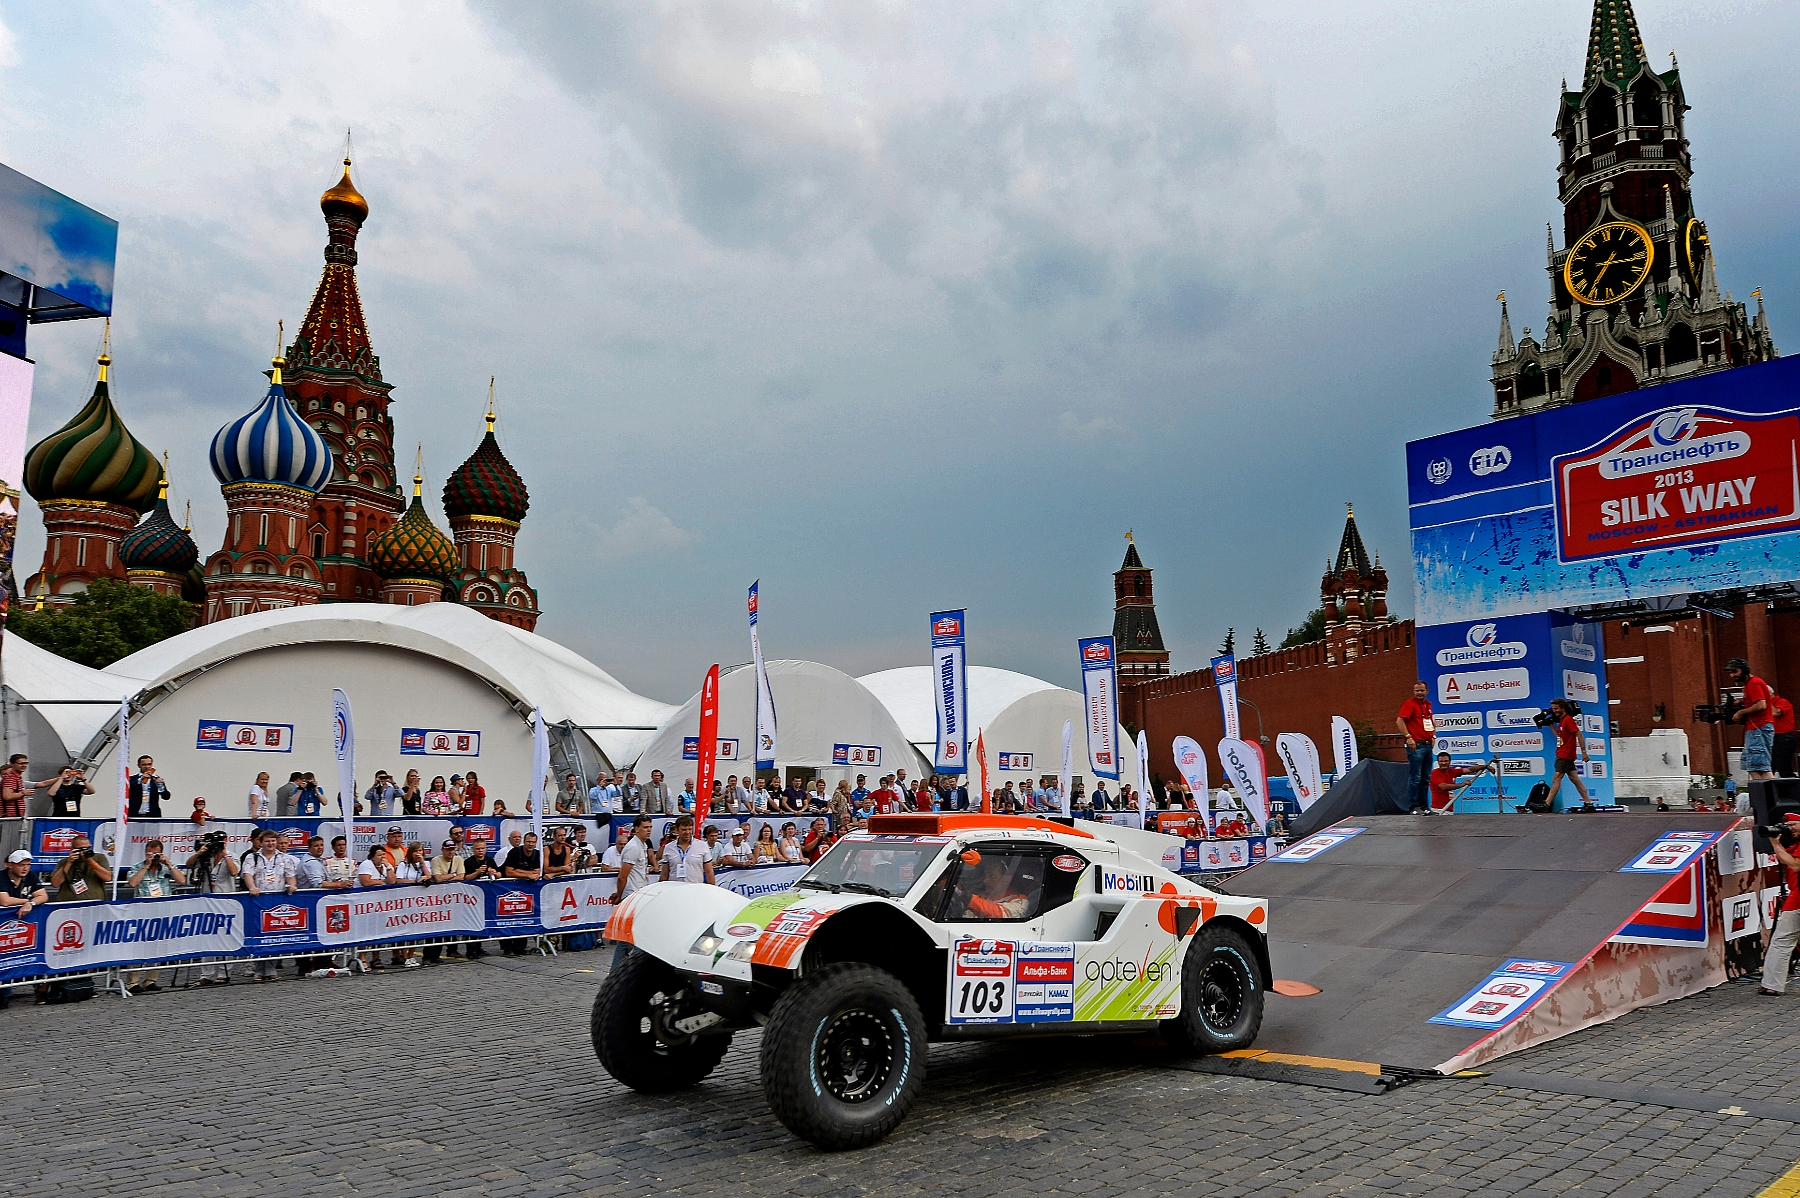 MOTORSPORT - DAKAR SERIES 2013 - SILK WAY RALLY (RUS) - MOSCOW TO SOCHI -  03 TO 14/07/2013 - PHOTO : ERIC VARGIOLU / DPPI -